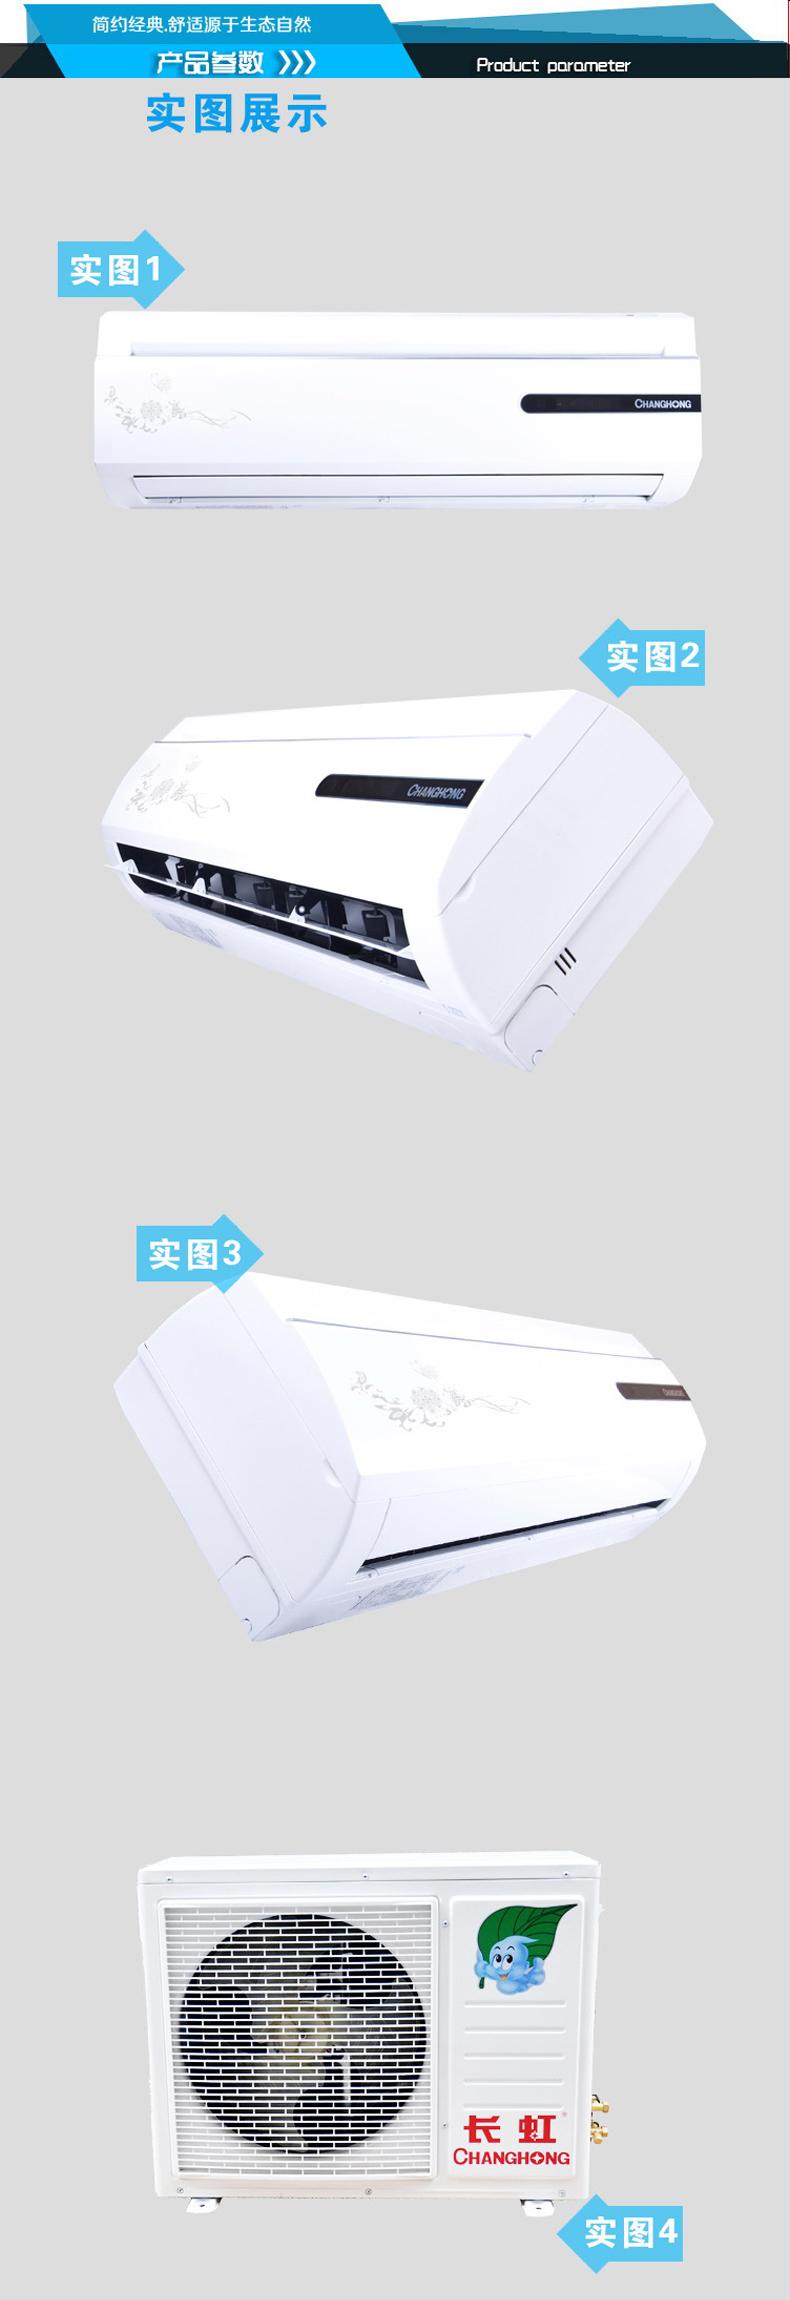 长虹空调型号:kfr-32gw/dhr(w1-h)+2